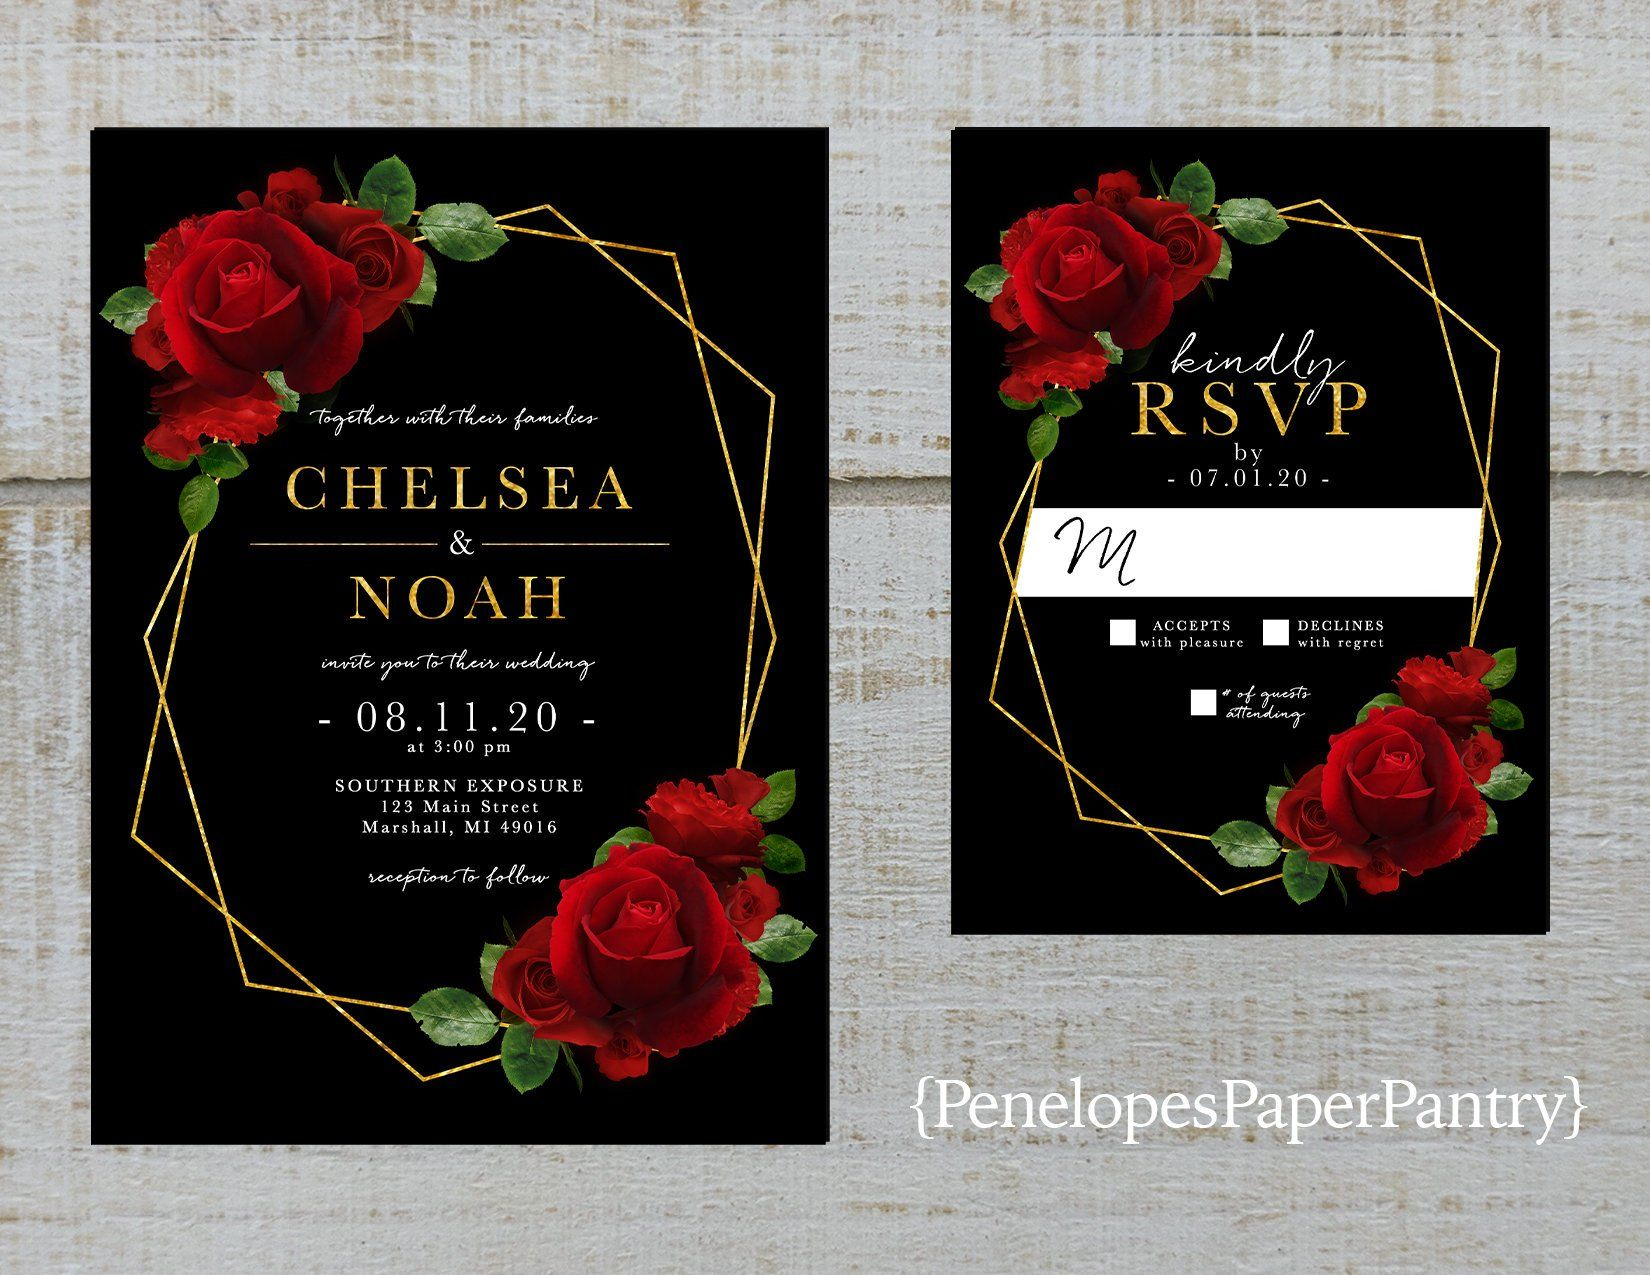 Elegant Red Rose Geometric Frame Wedding Invitation Black Red Roses Gold Print Shimmery P Red Wedding Invitations Red Rose Invitation Black Wedding Invitations